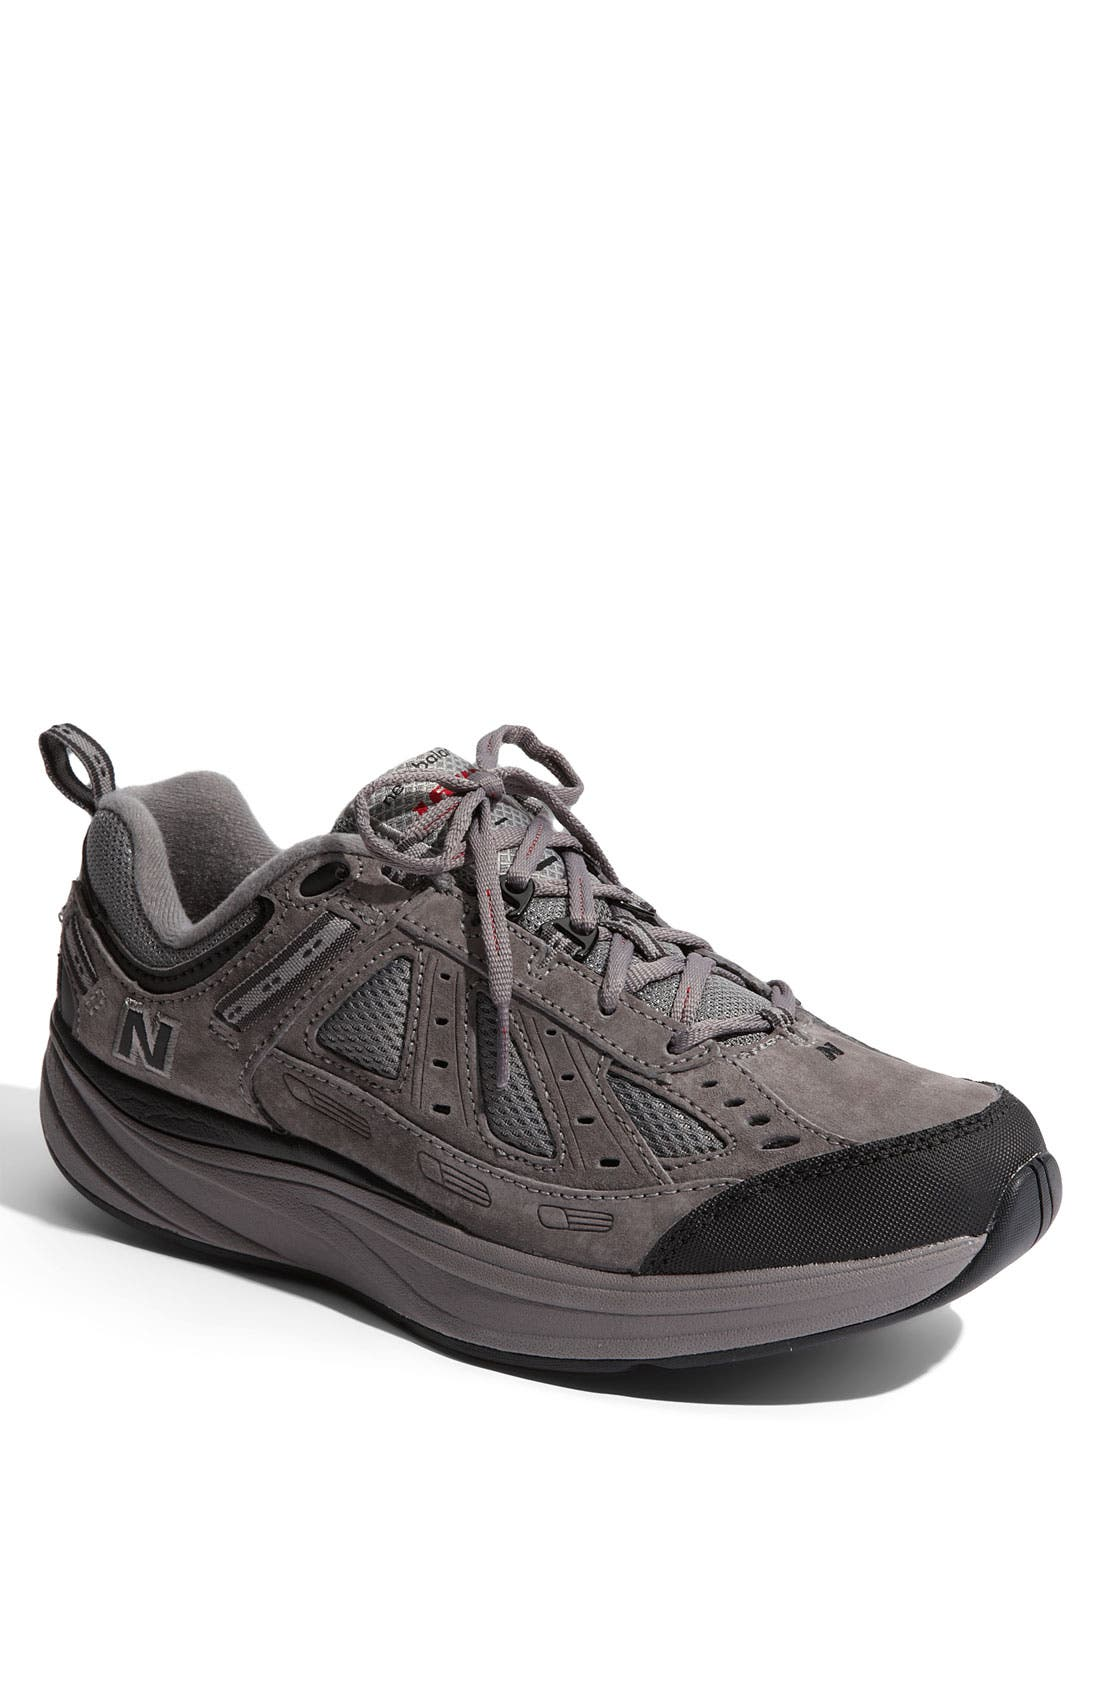 '1645' Toning Shoe, Main, color, 030